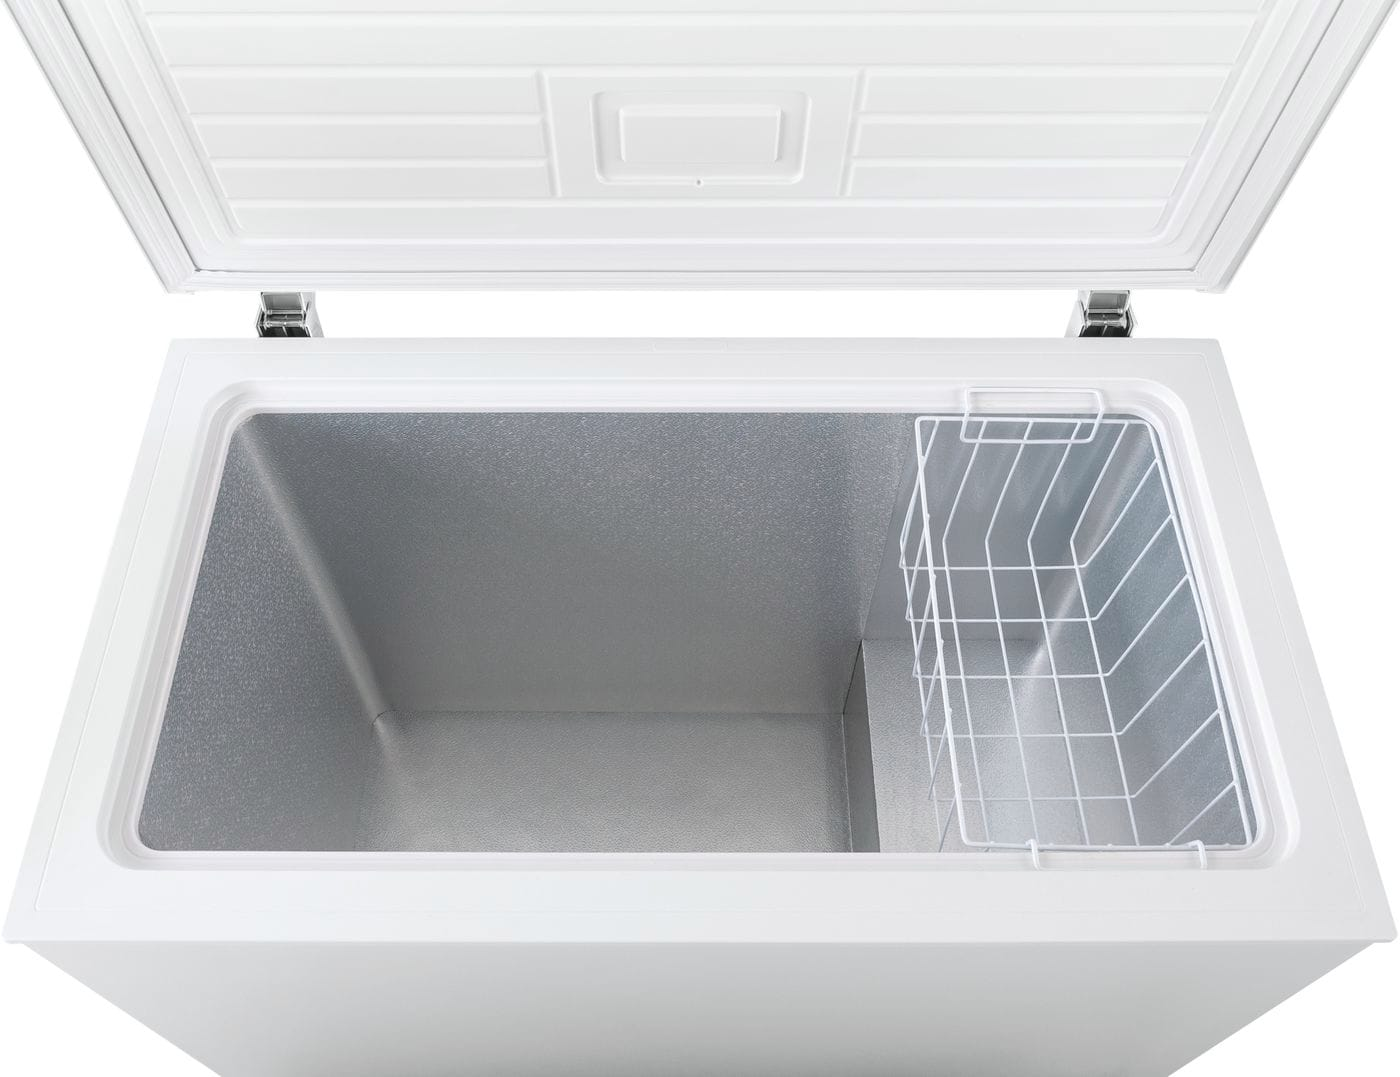 Model: FFFC09M1RW | 8.7 Cu. Ft. Chest Freezer